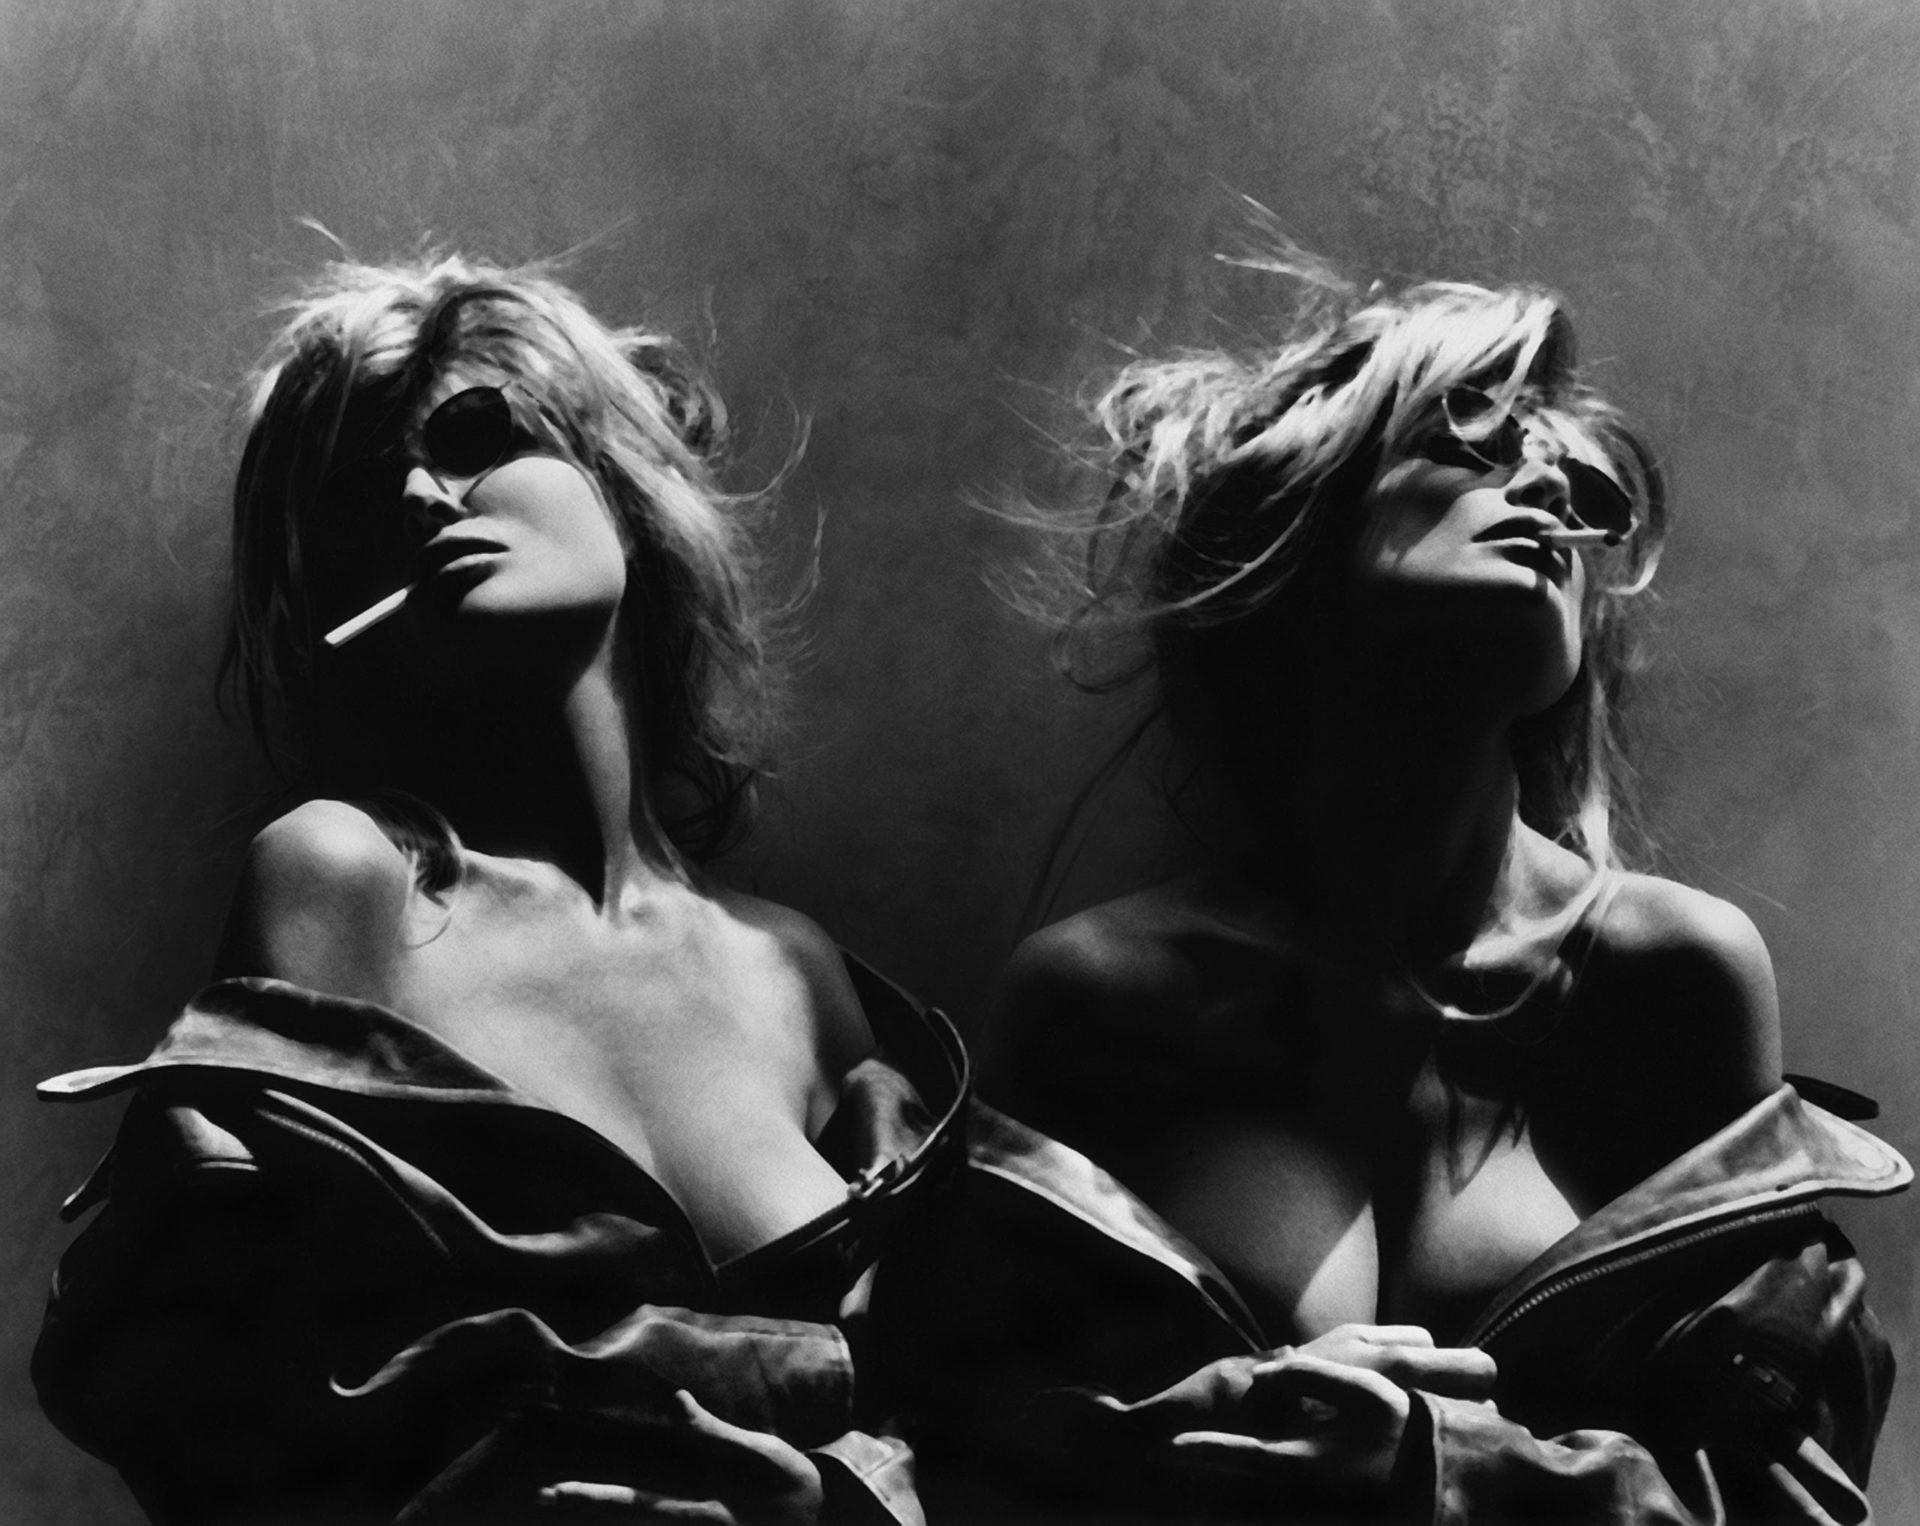 Greg Gorman © Barbi Twins Los Angeles 1992 Courtesy 29 ARTS IN PROGRESS gallery 1 scaled - Milano Photofestival